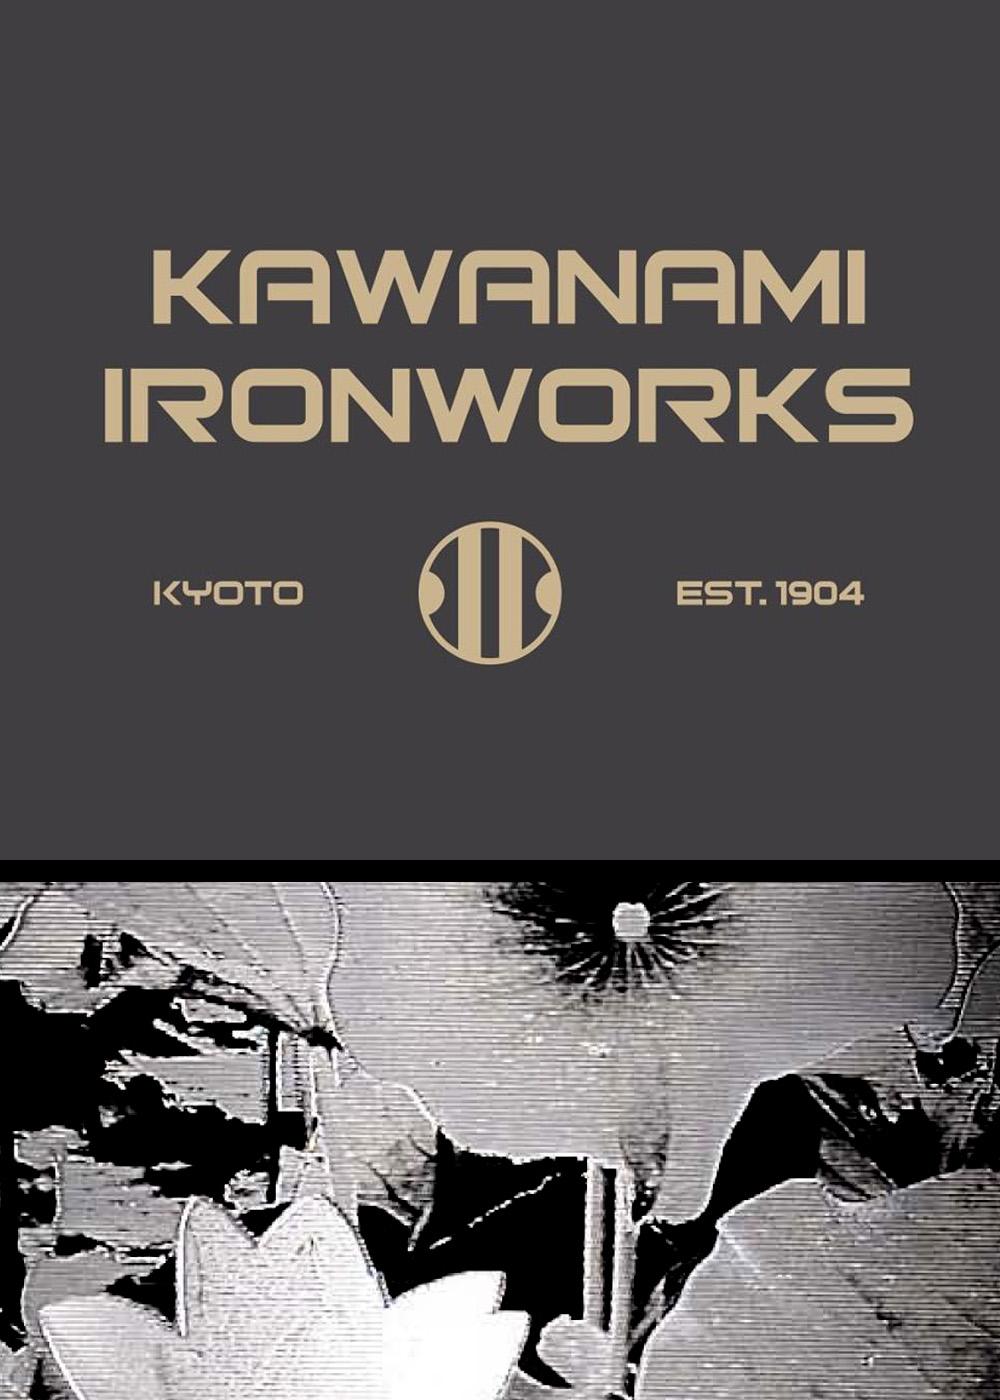 KAWANAMI IRON WORKS